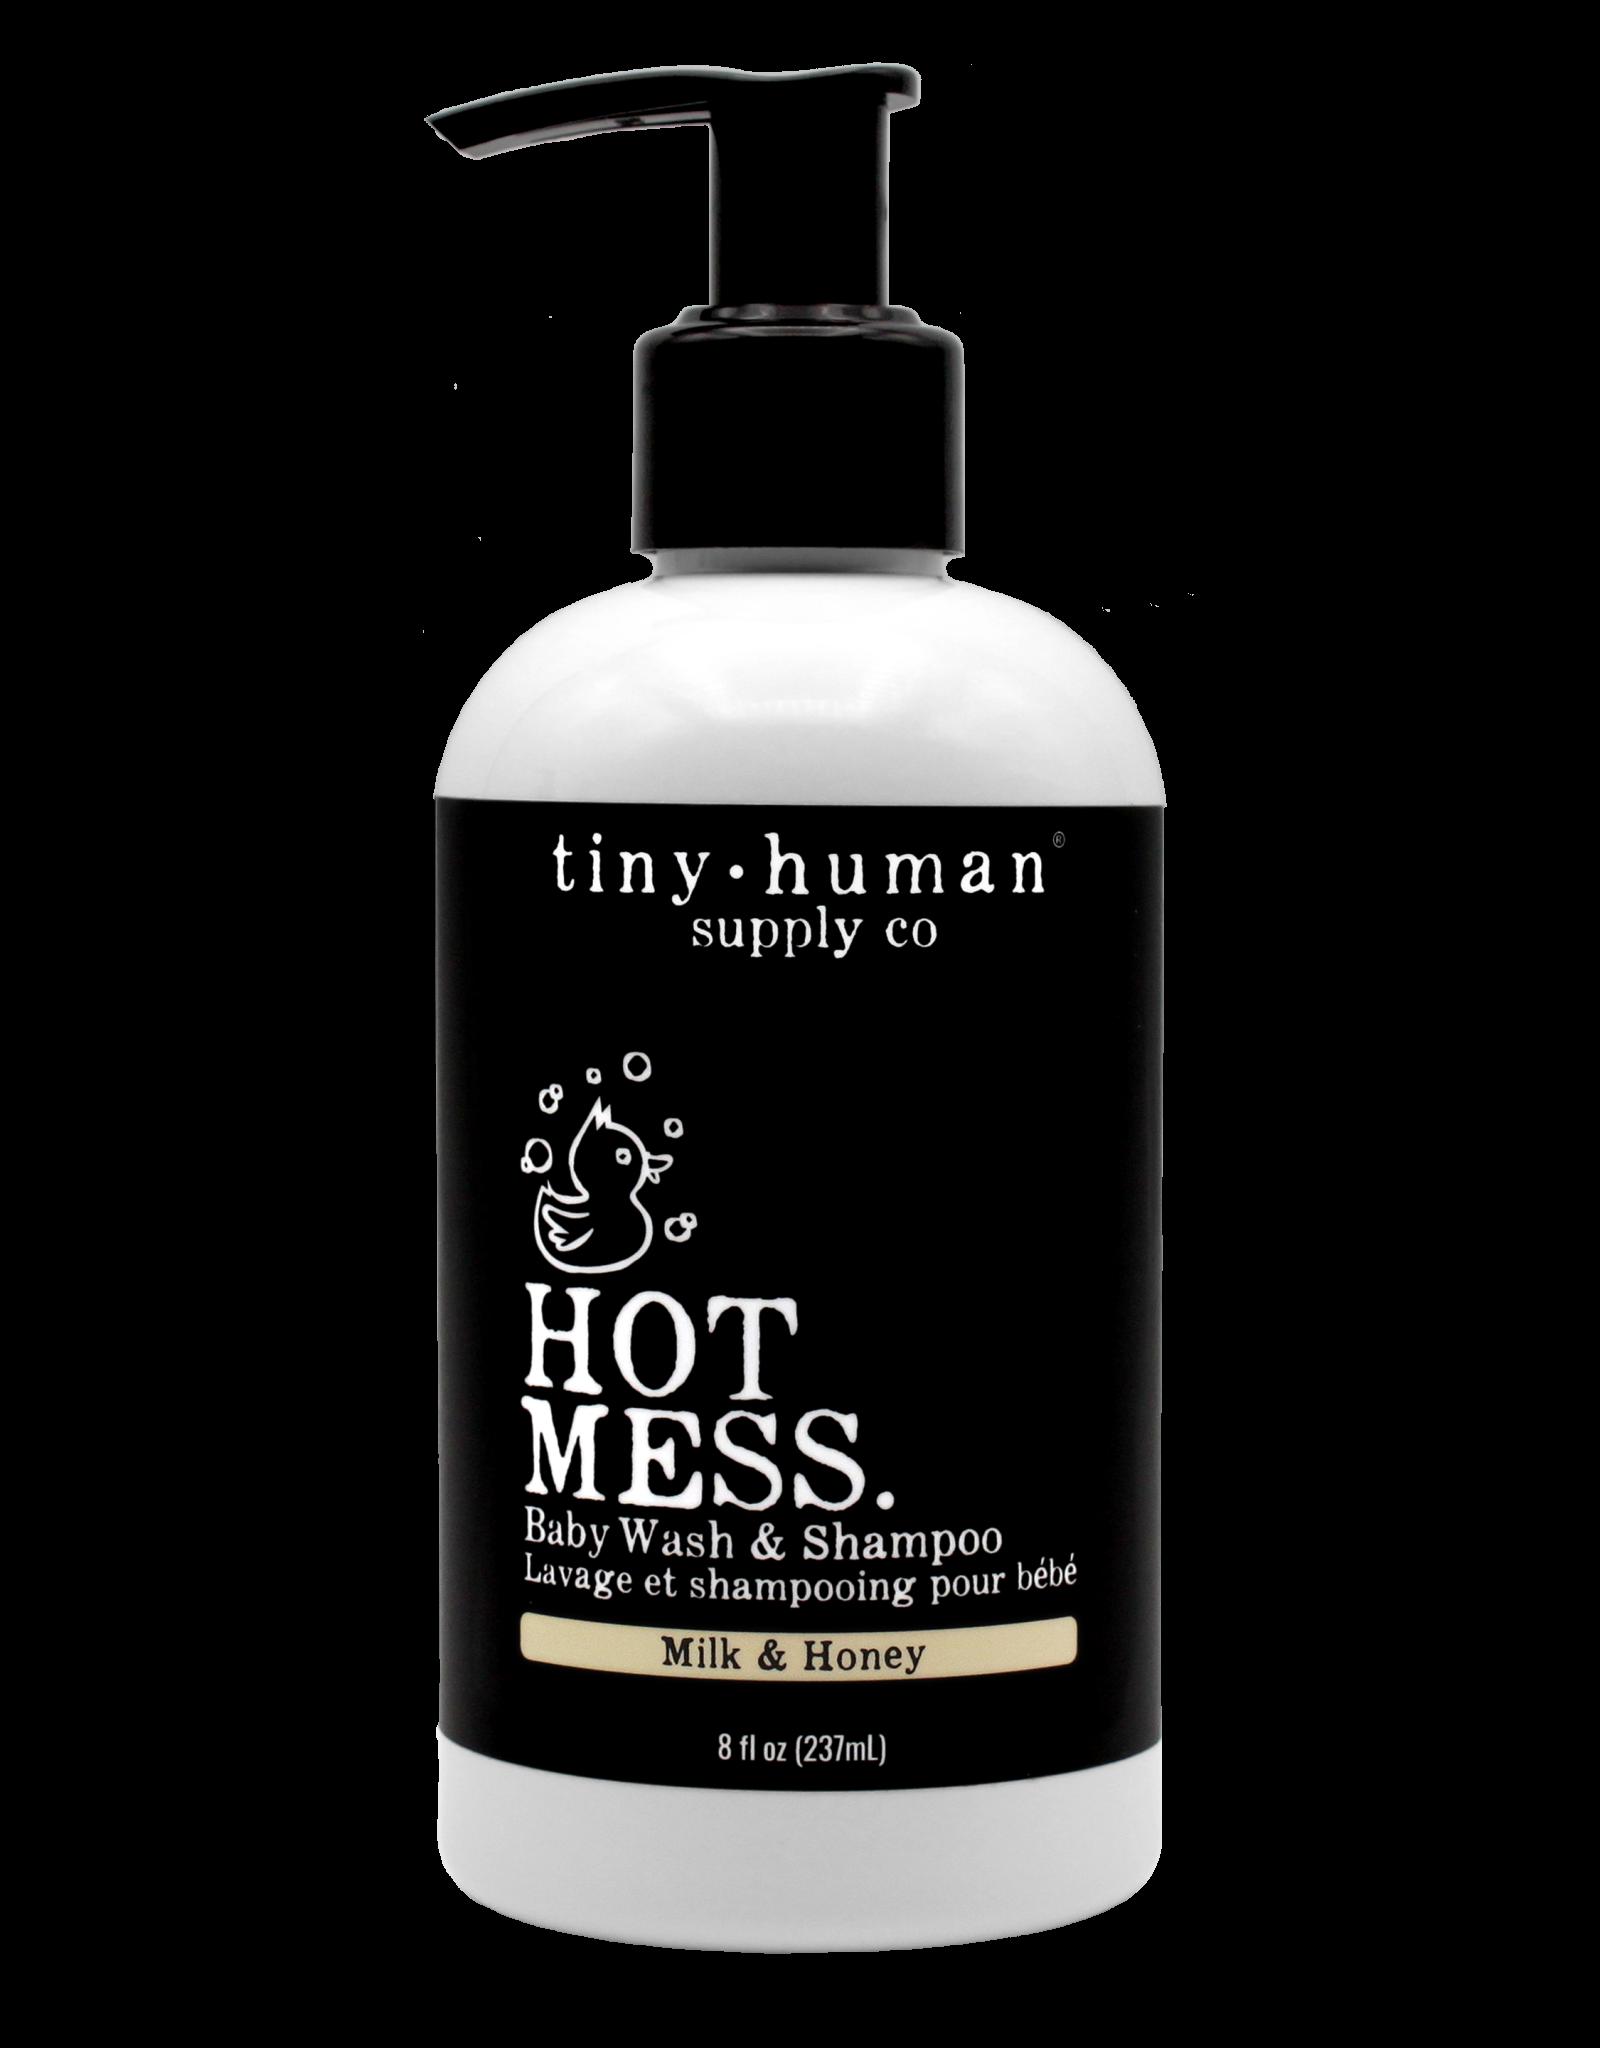 Tiny Human Supply Co. Tiny Human Supply Co. | Hot Mess - Shampoo & Baby Wash (Milk & Honey)